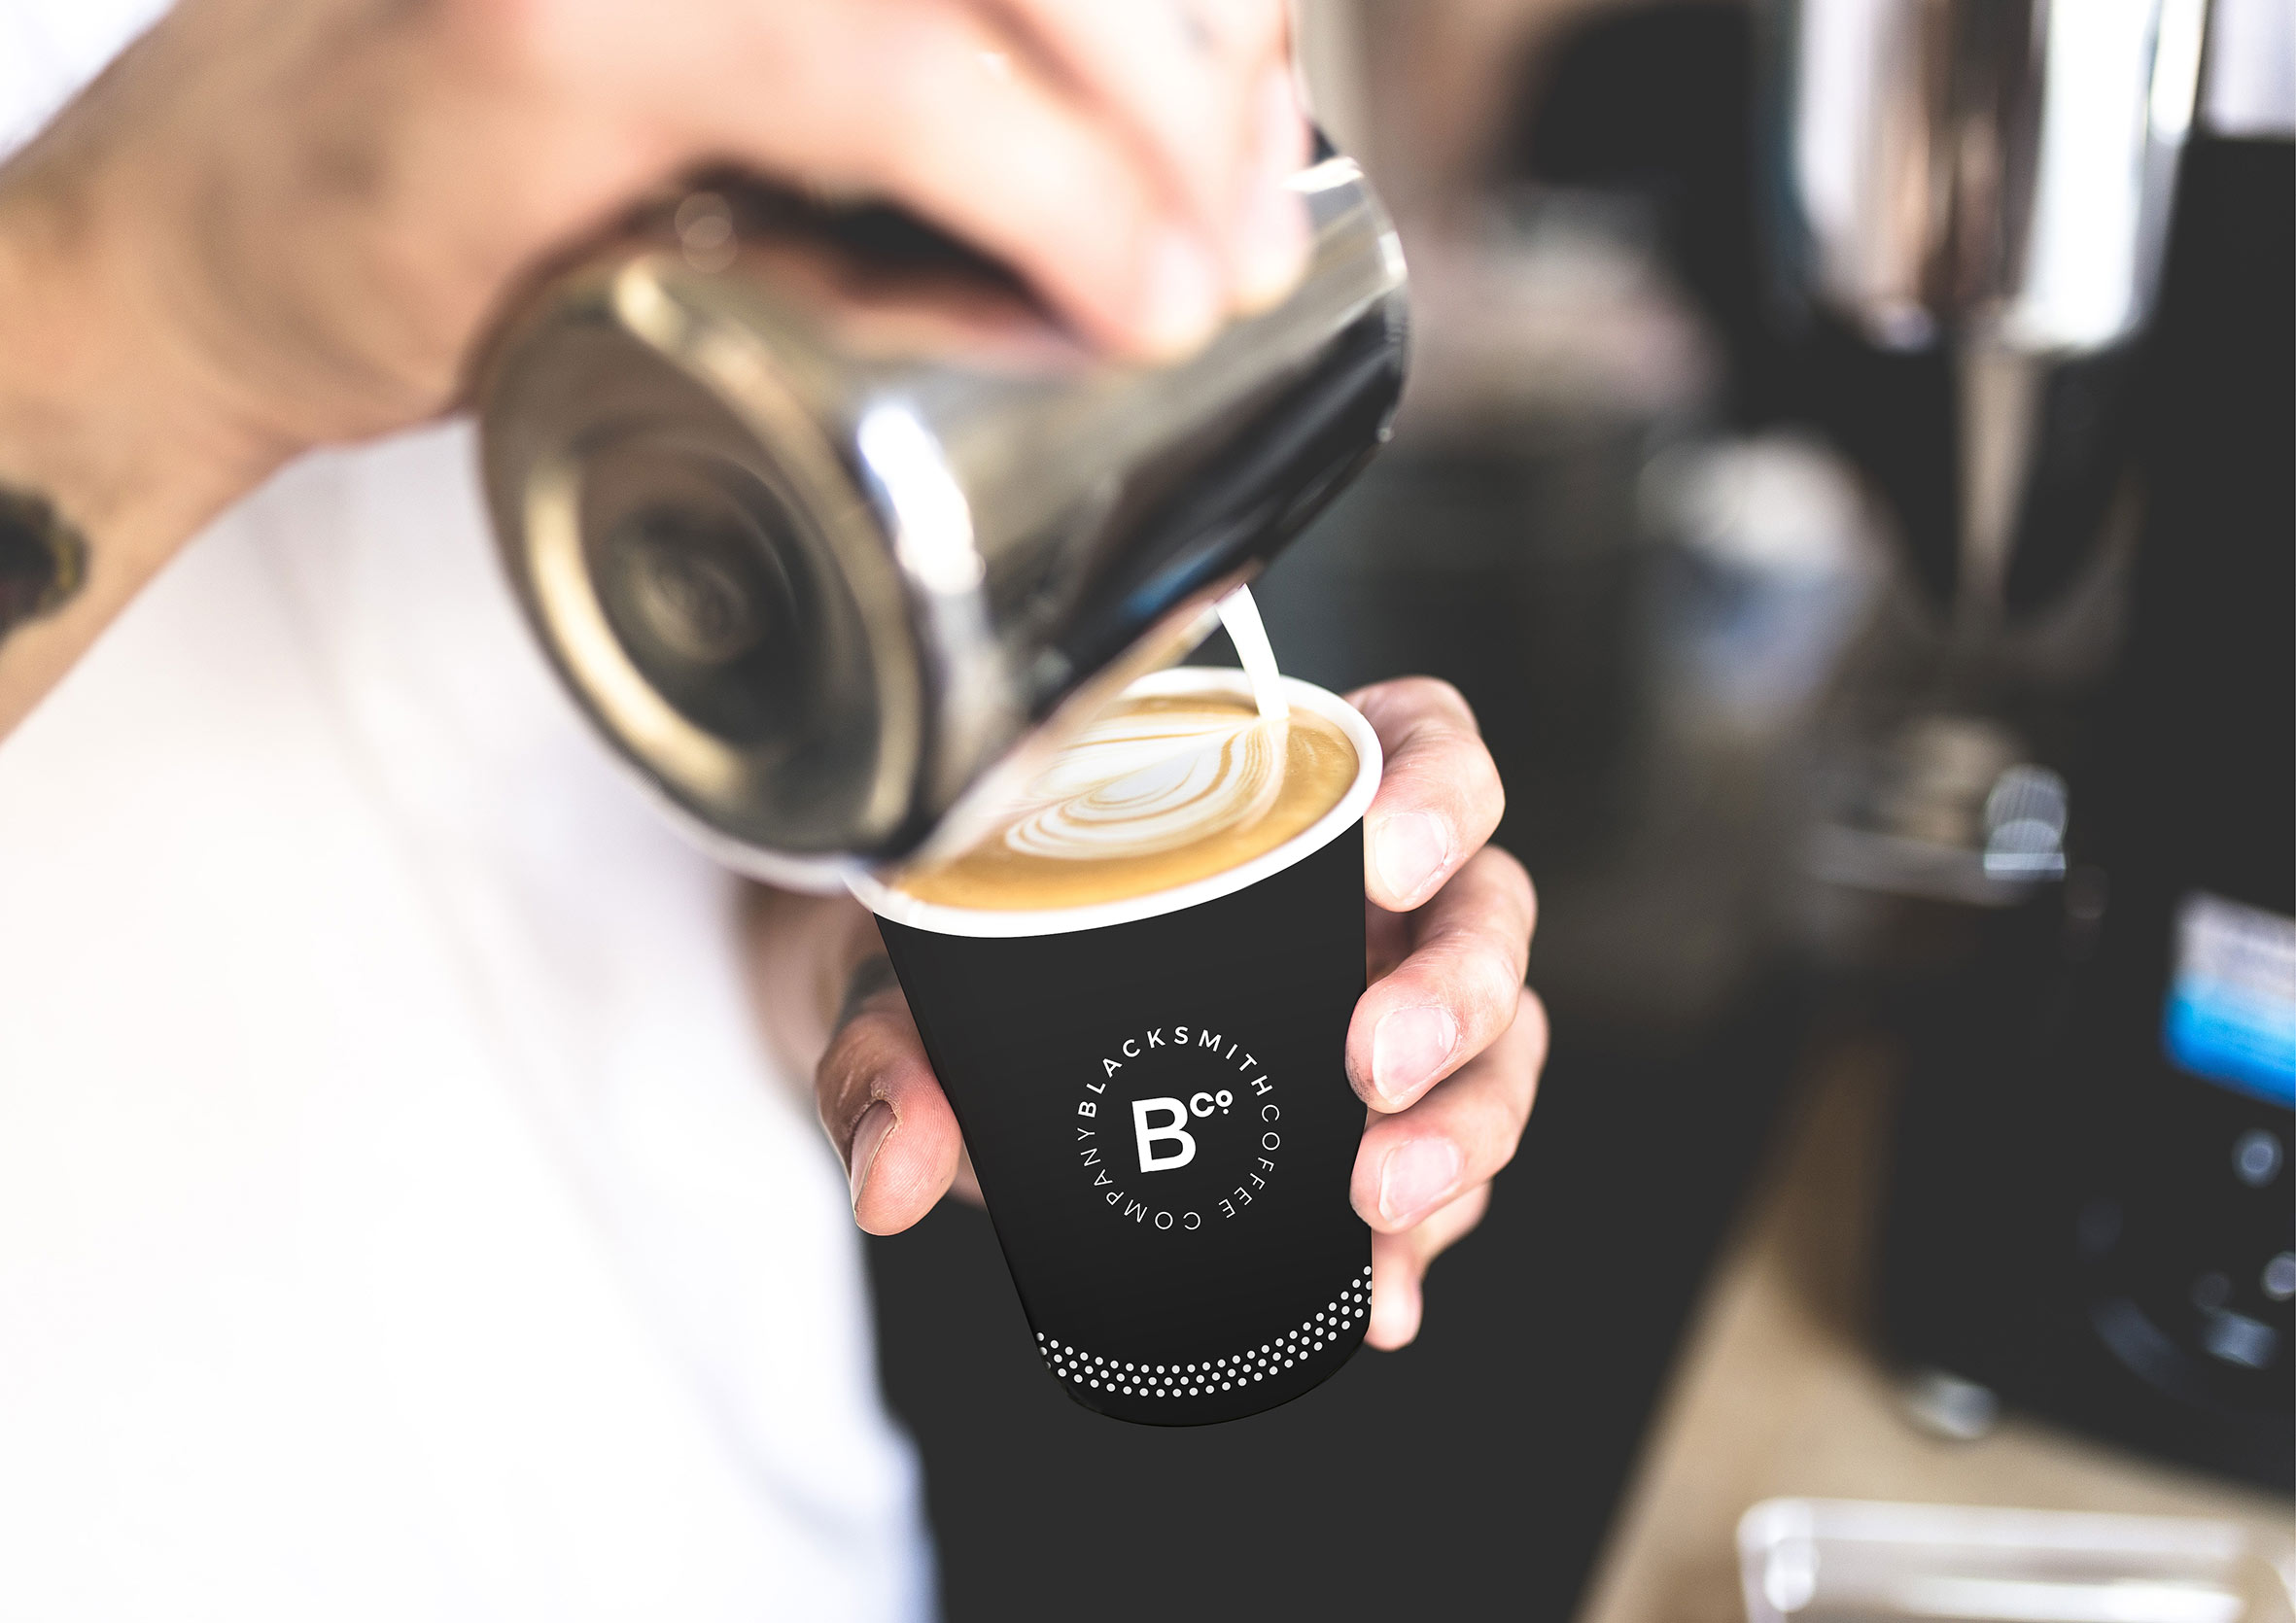 Blacksmith-identite-branding-coffee-paper-cup.jpg